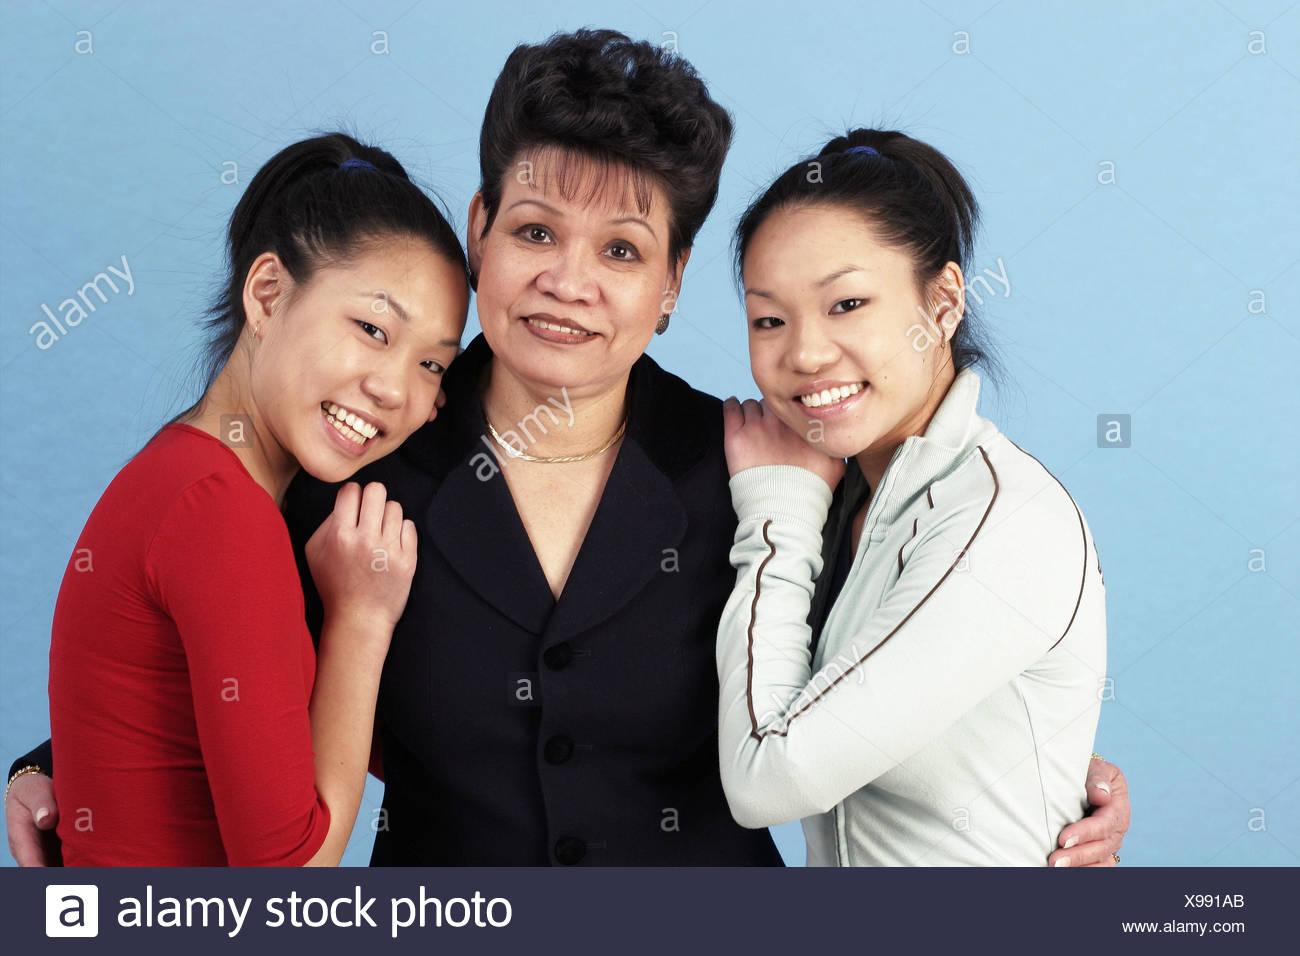 Confirm. happens. Female asian twins